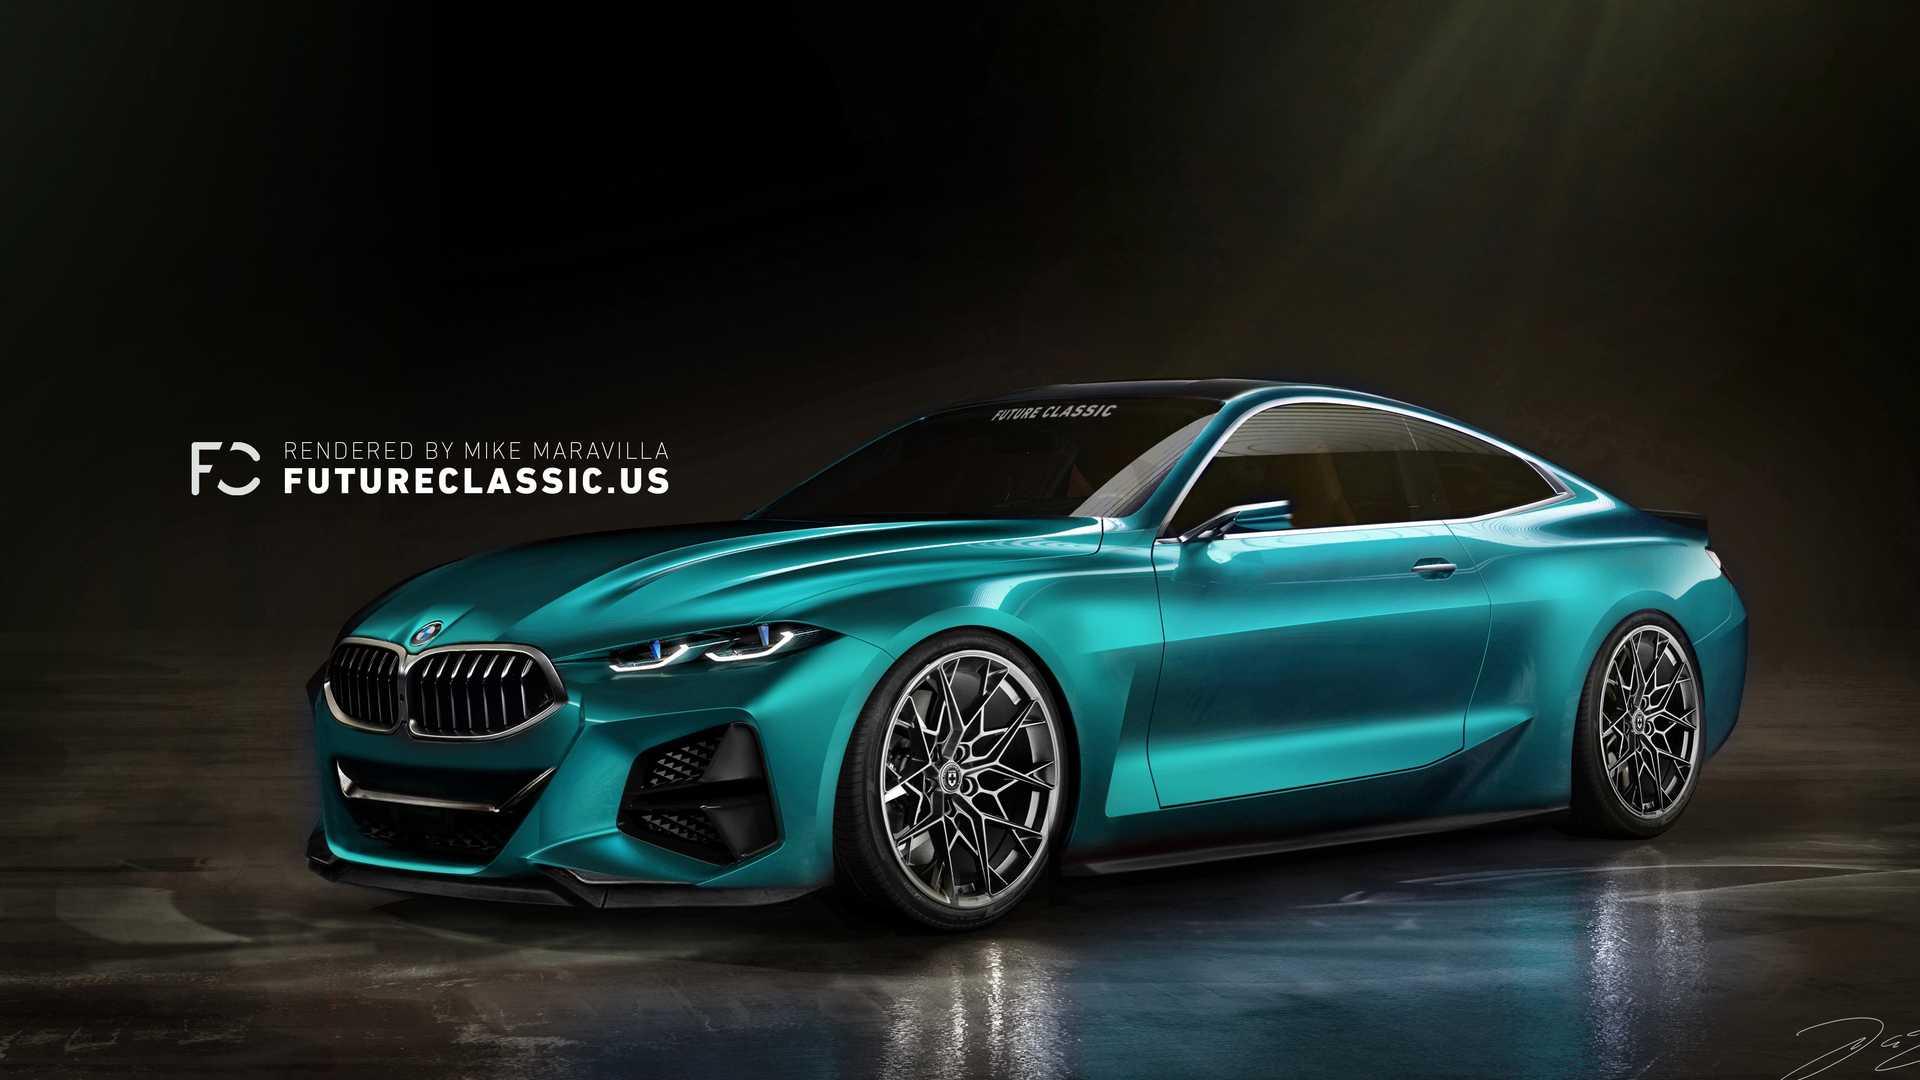 تجلی هنر طراحی بیامو در کانسپت خودروی BMW 4 +تصاویر